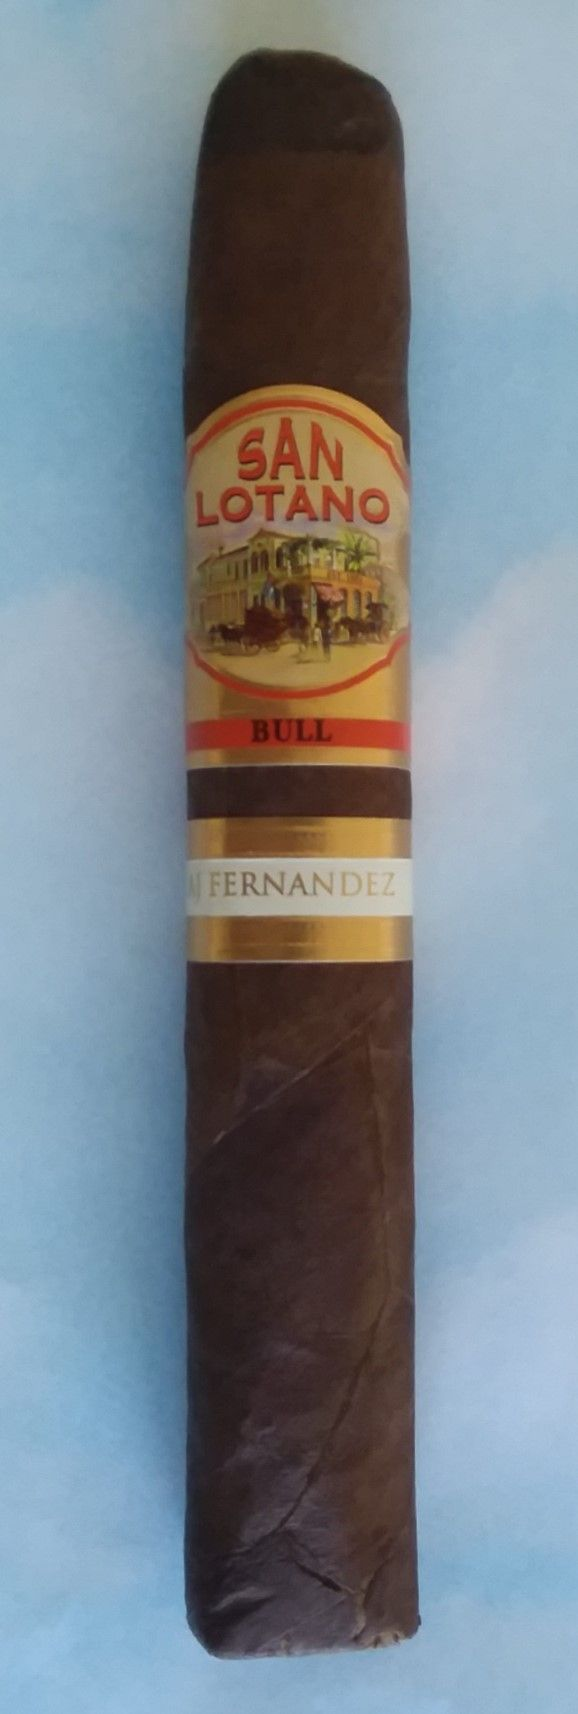 San Lotano Bull Cigar